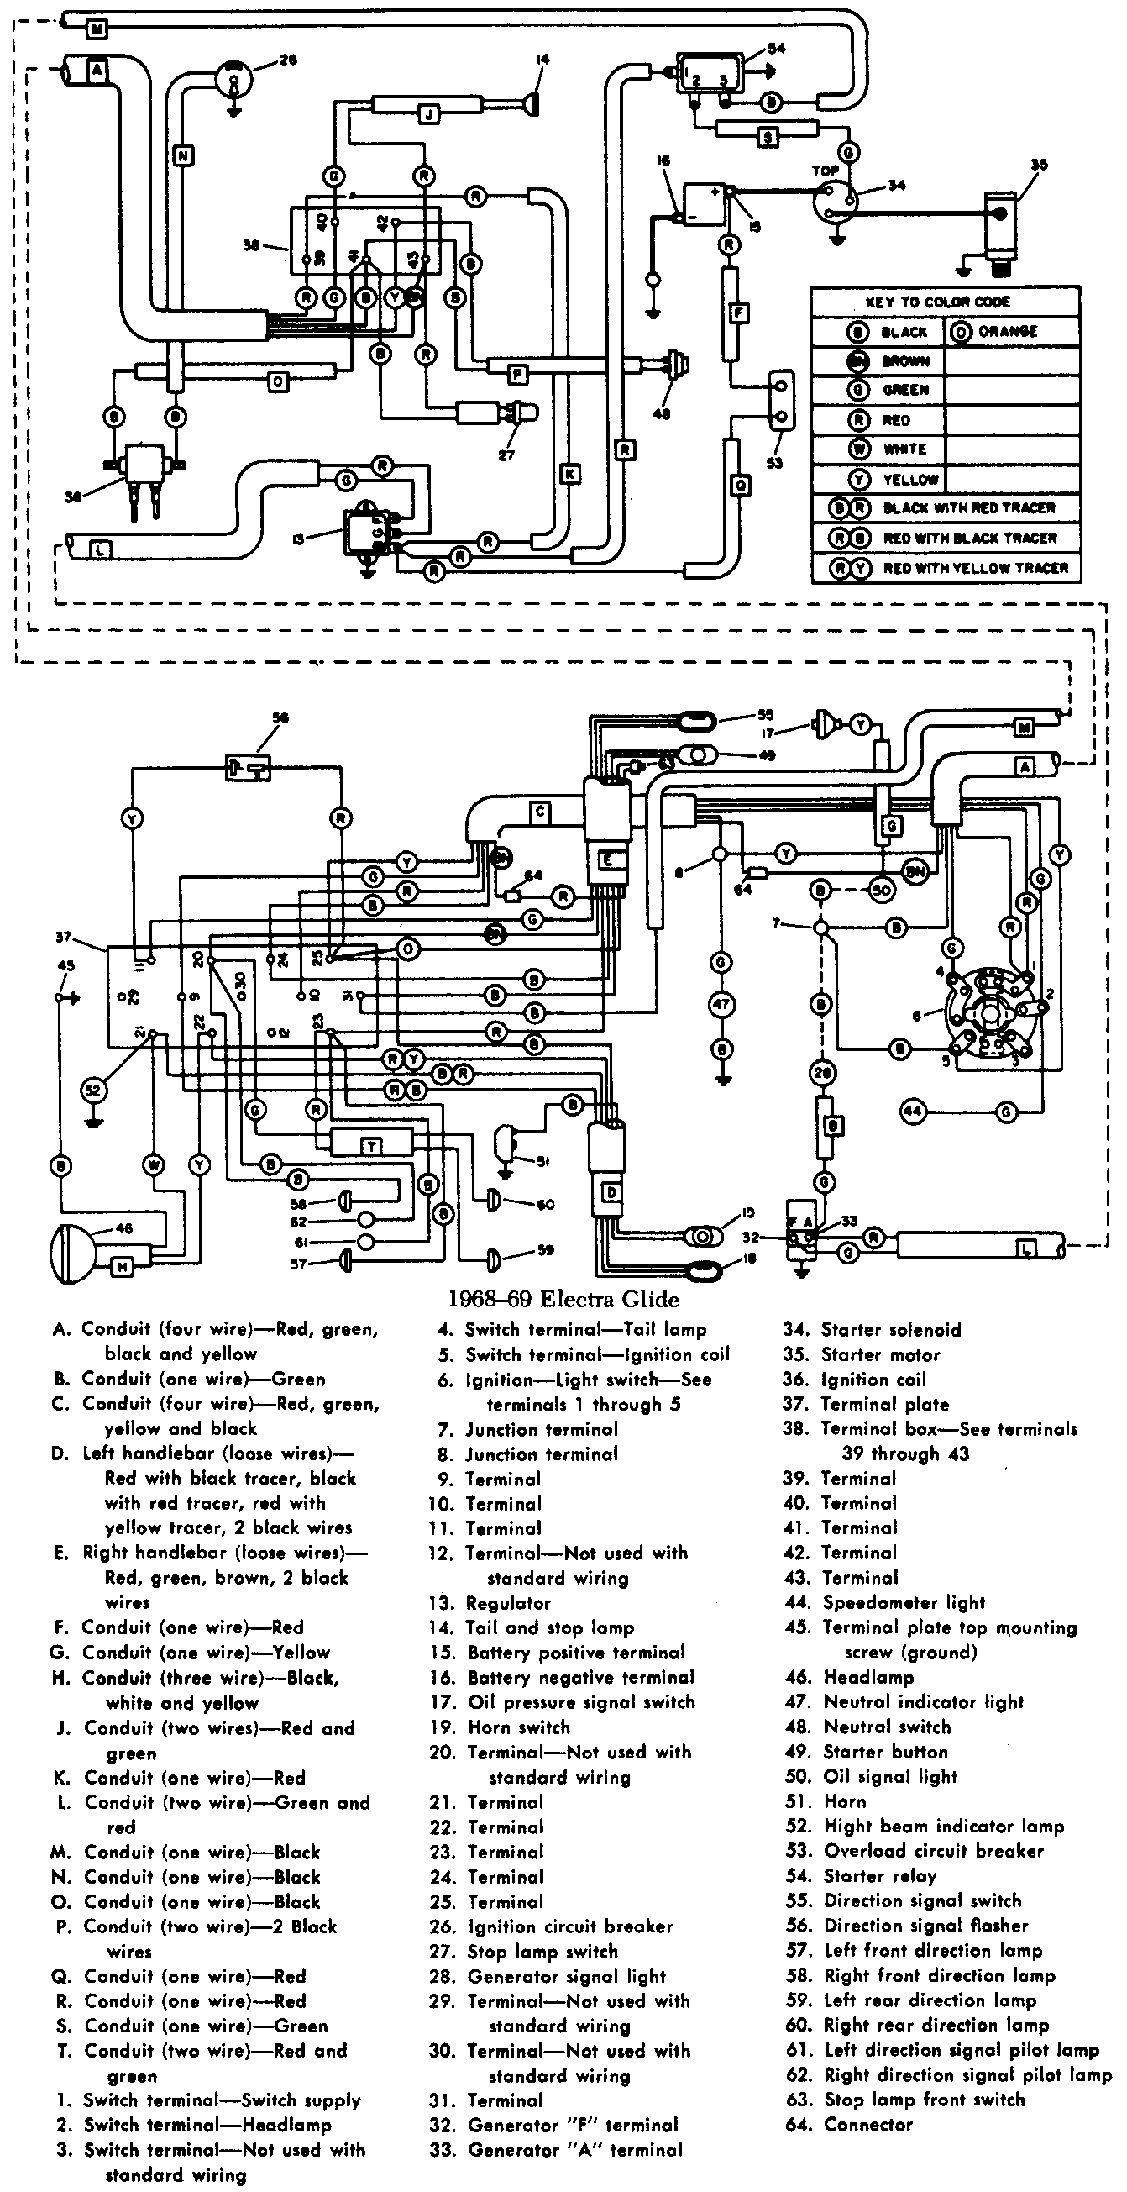 New Wiring Diagram For Emergency Key Switch Diagram